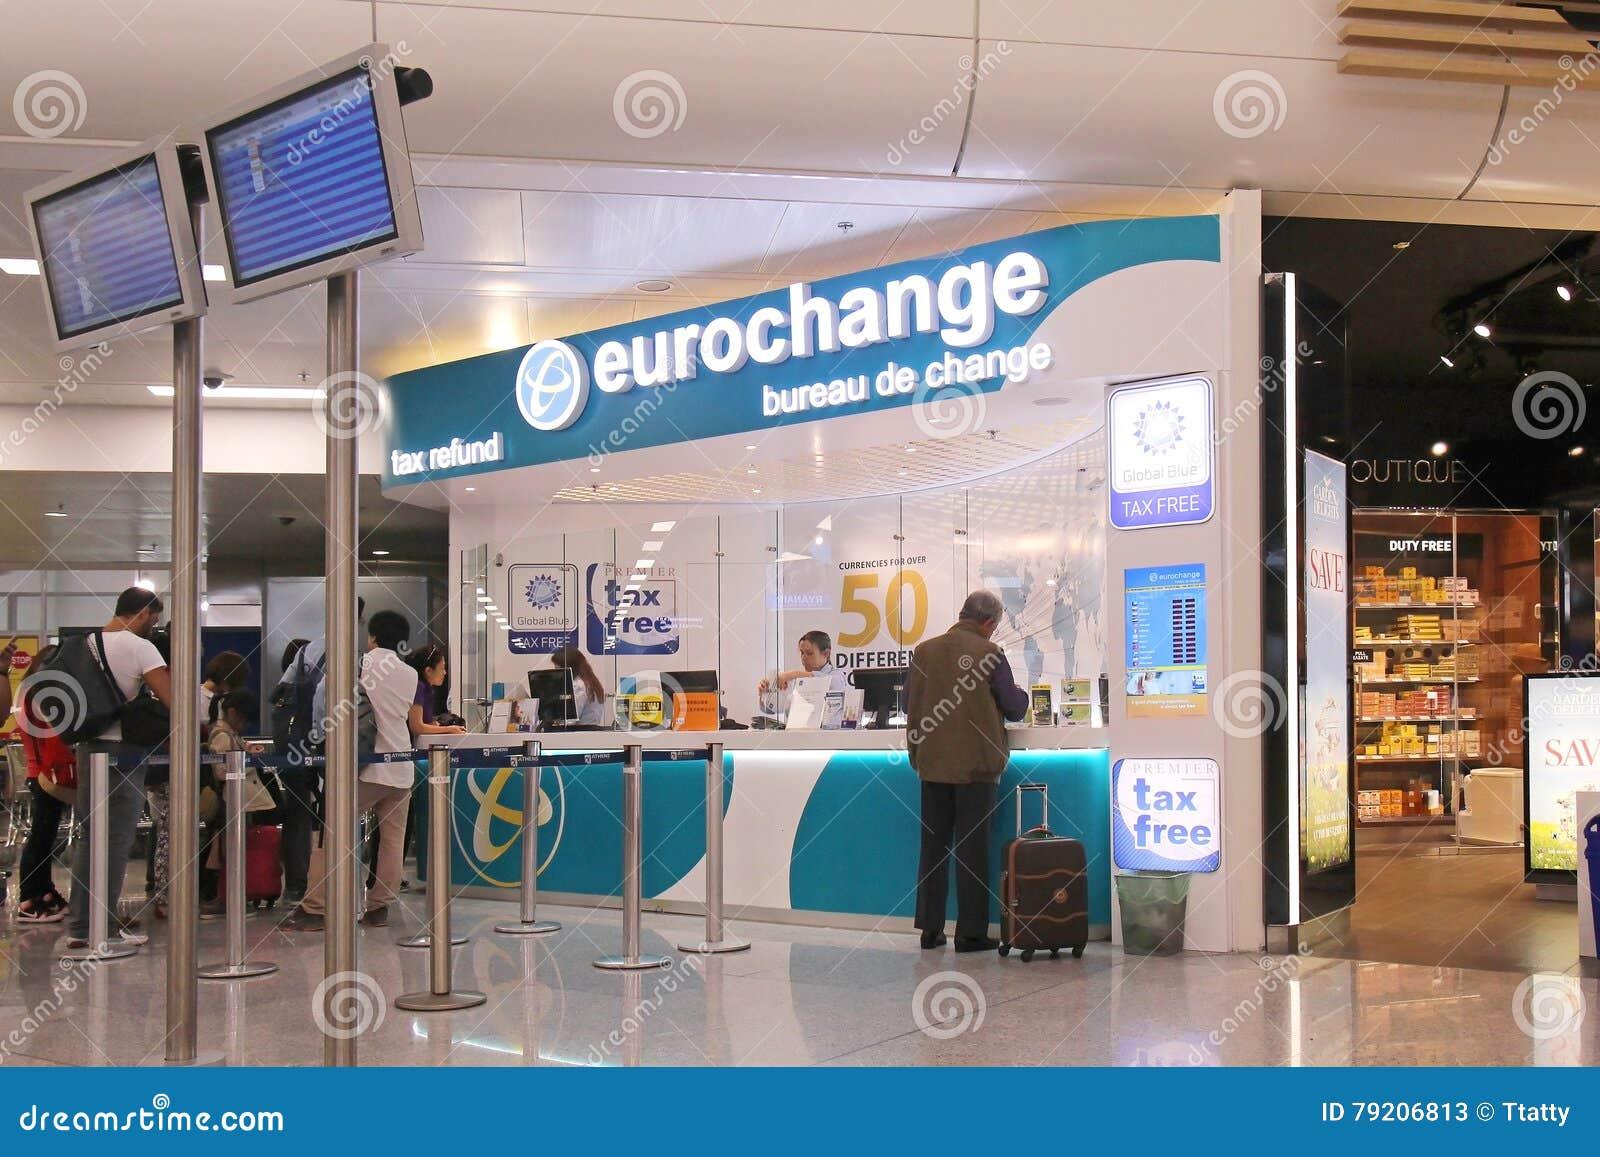 Exchange bureau de change: motion of passengers at foreign currency